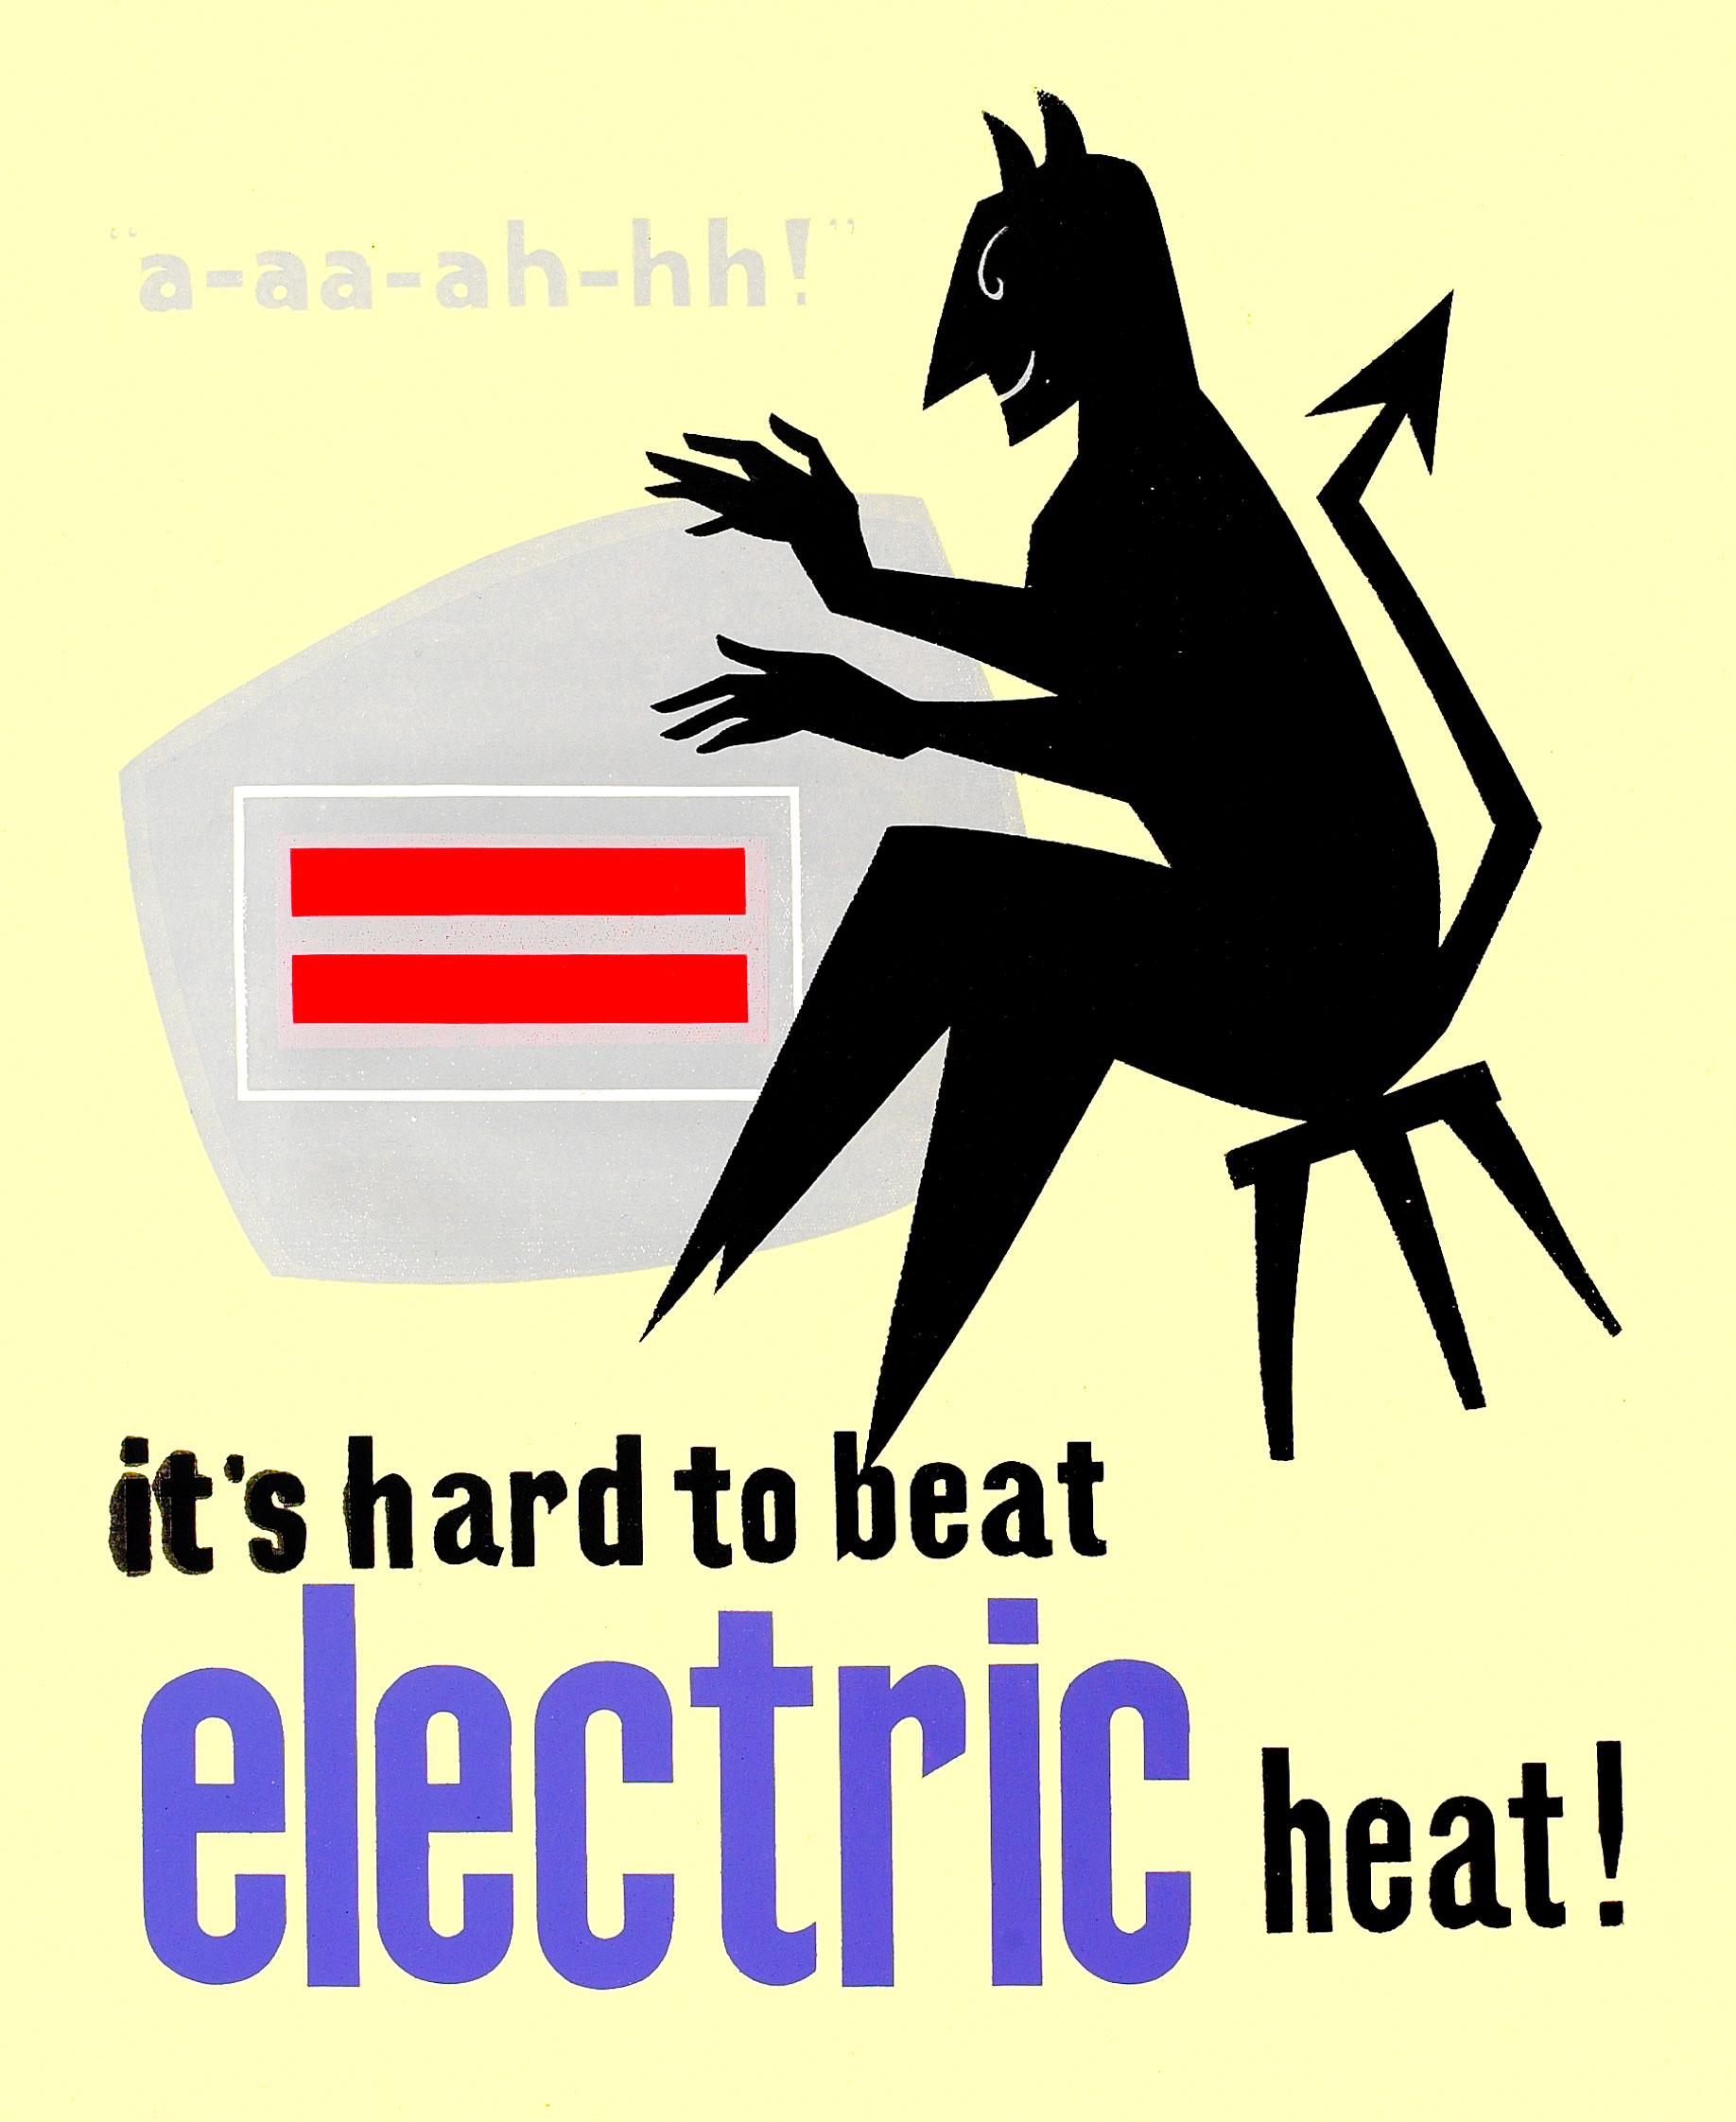 ESB print advert, late 1950s